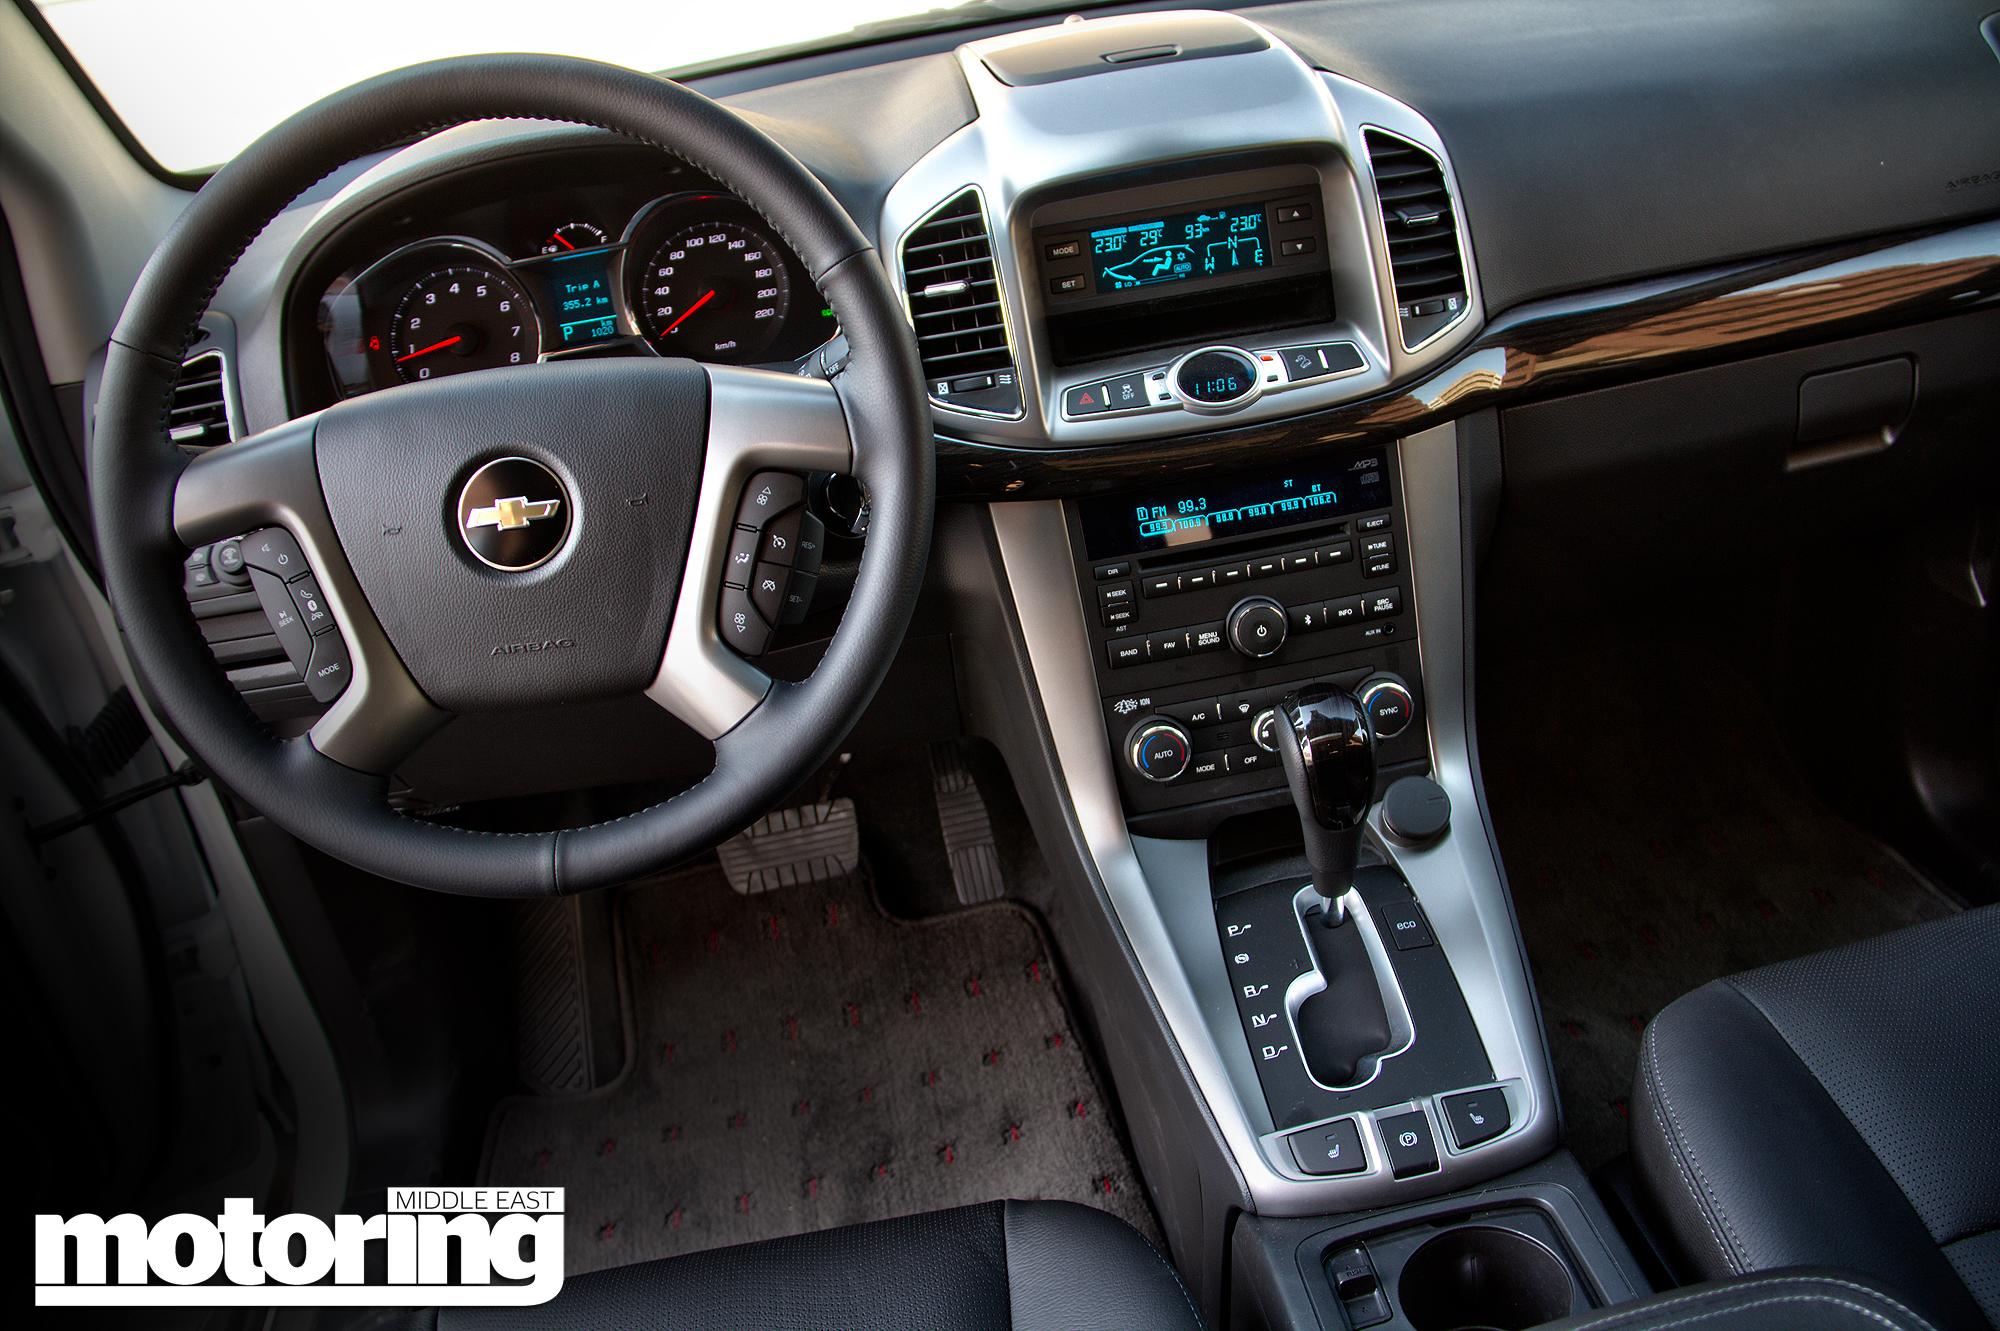 Kekurangan Chevrolet Captiva 2014 Murah Berkualitas